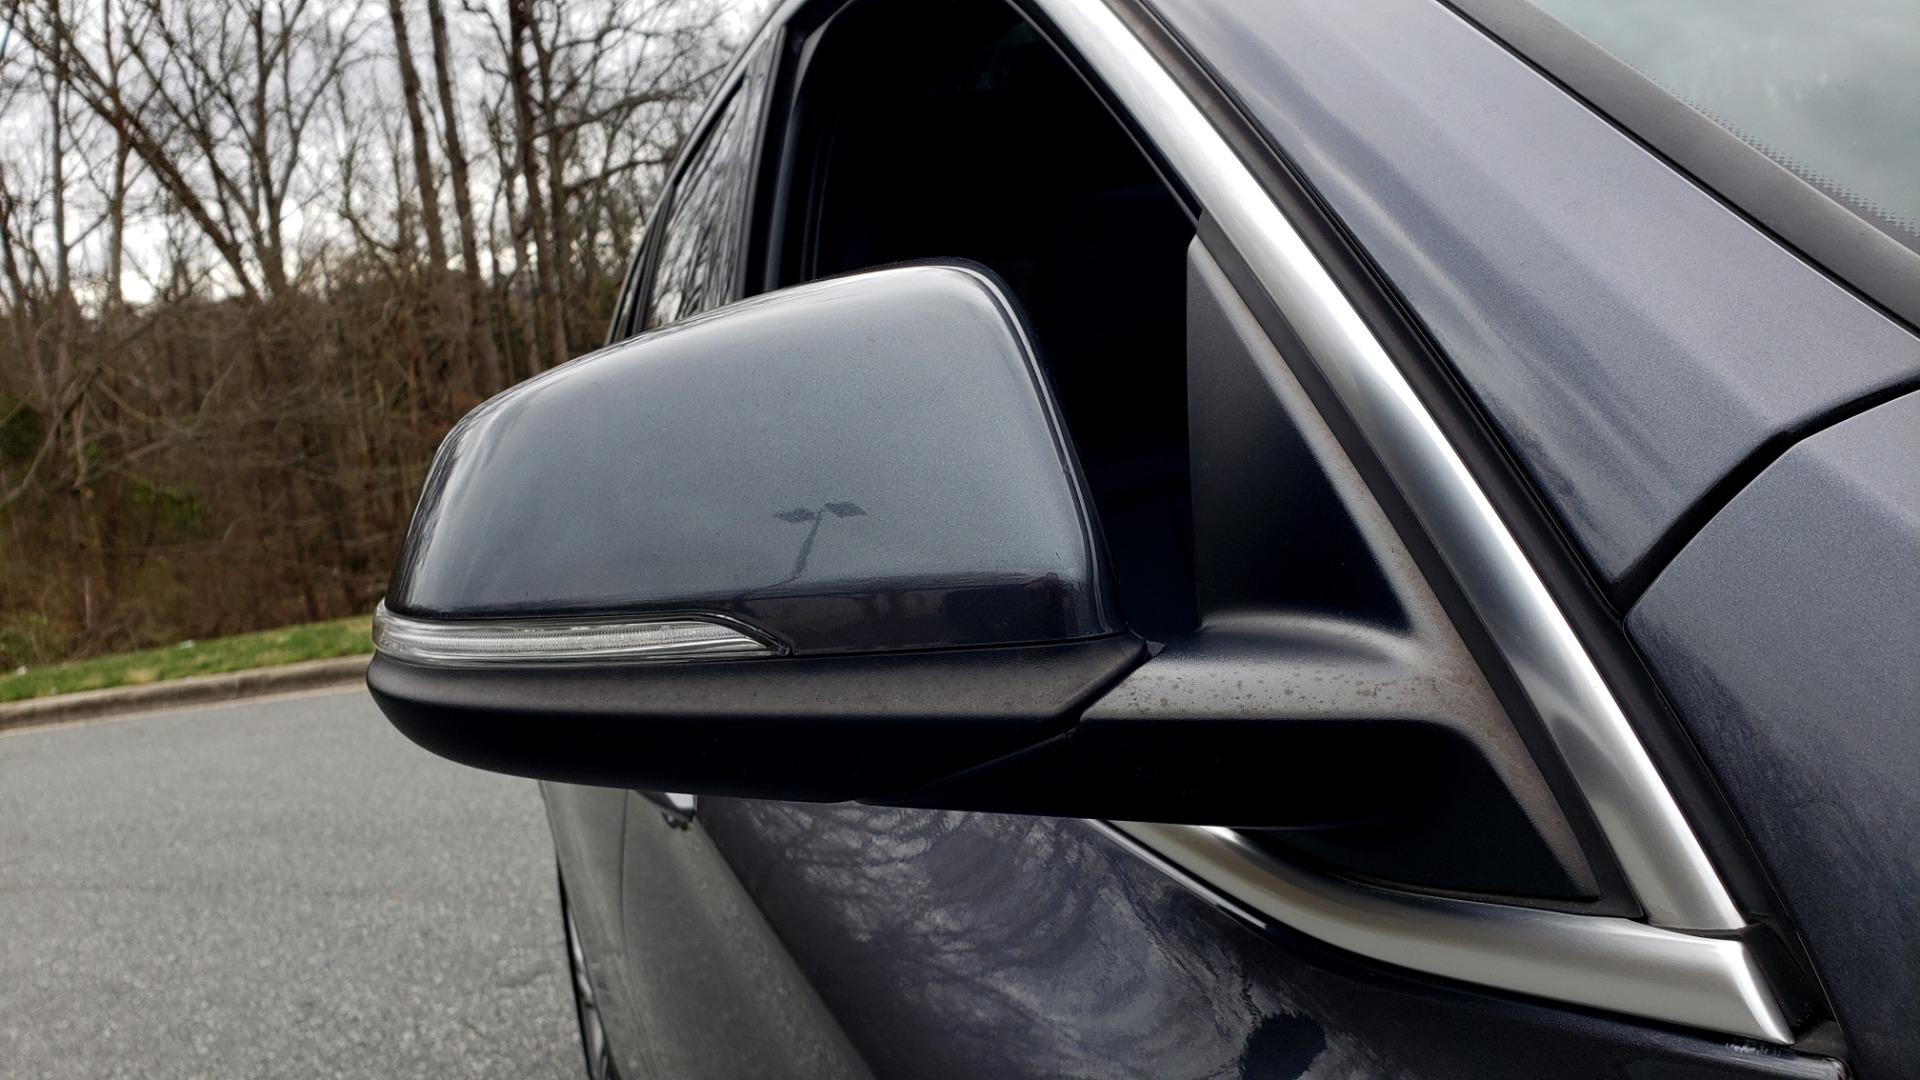 Used 2017 BMW X1 XDRIVE28I / PREM PKG / DRIVER ASST / NAV / CLD WTHR for sale Sold at Formula Imports in Charlotte NC 28227 26